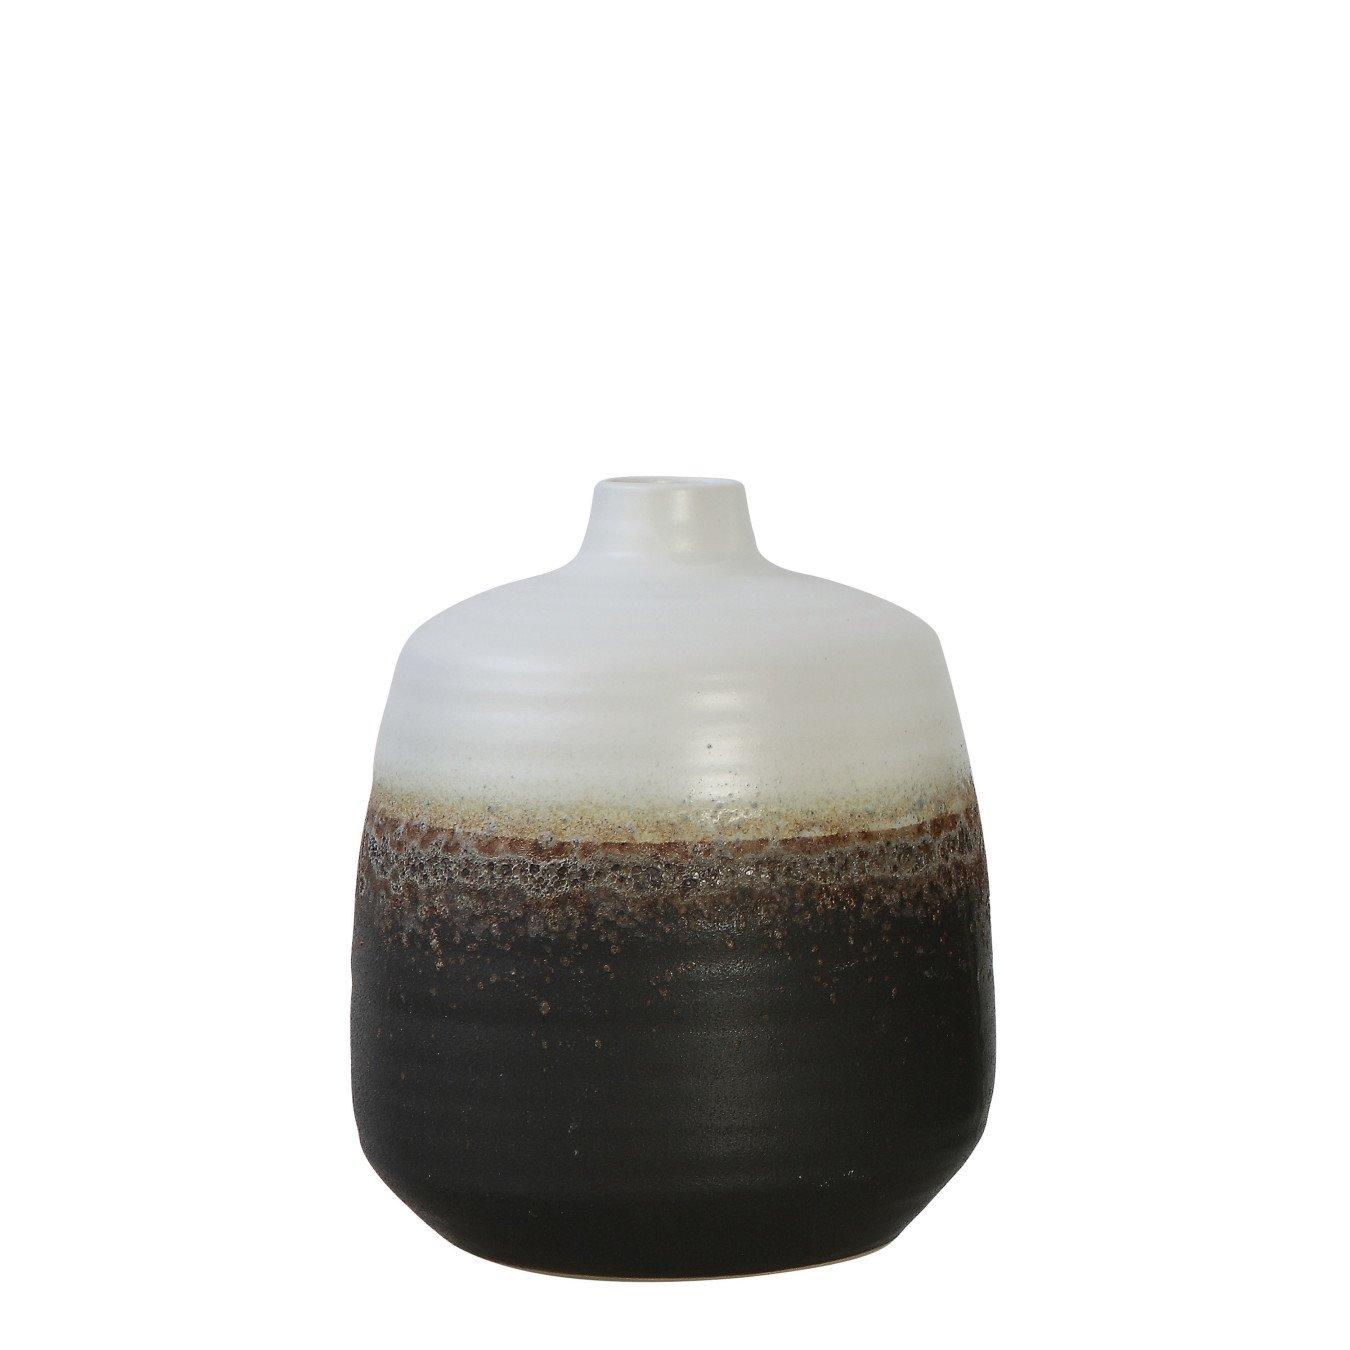 Black & White Ceramic Vase with Brown Reactive Glaze Accent